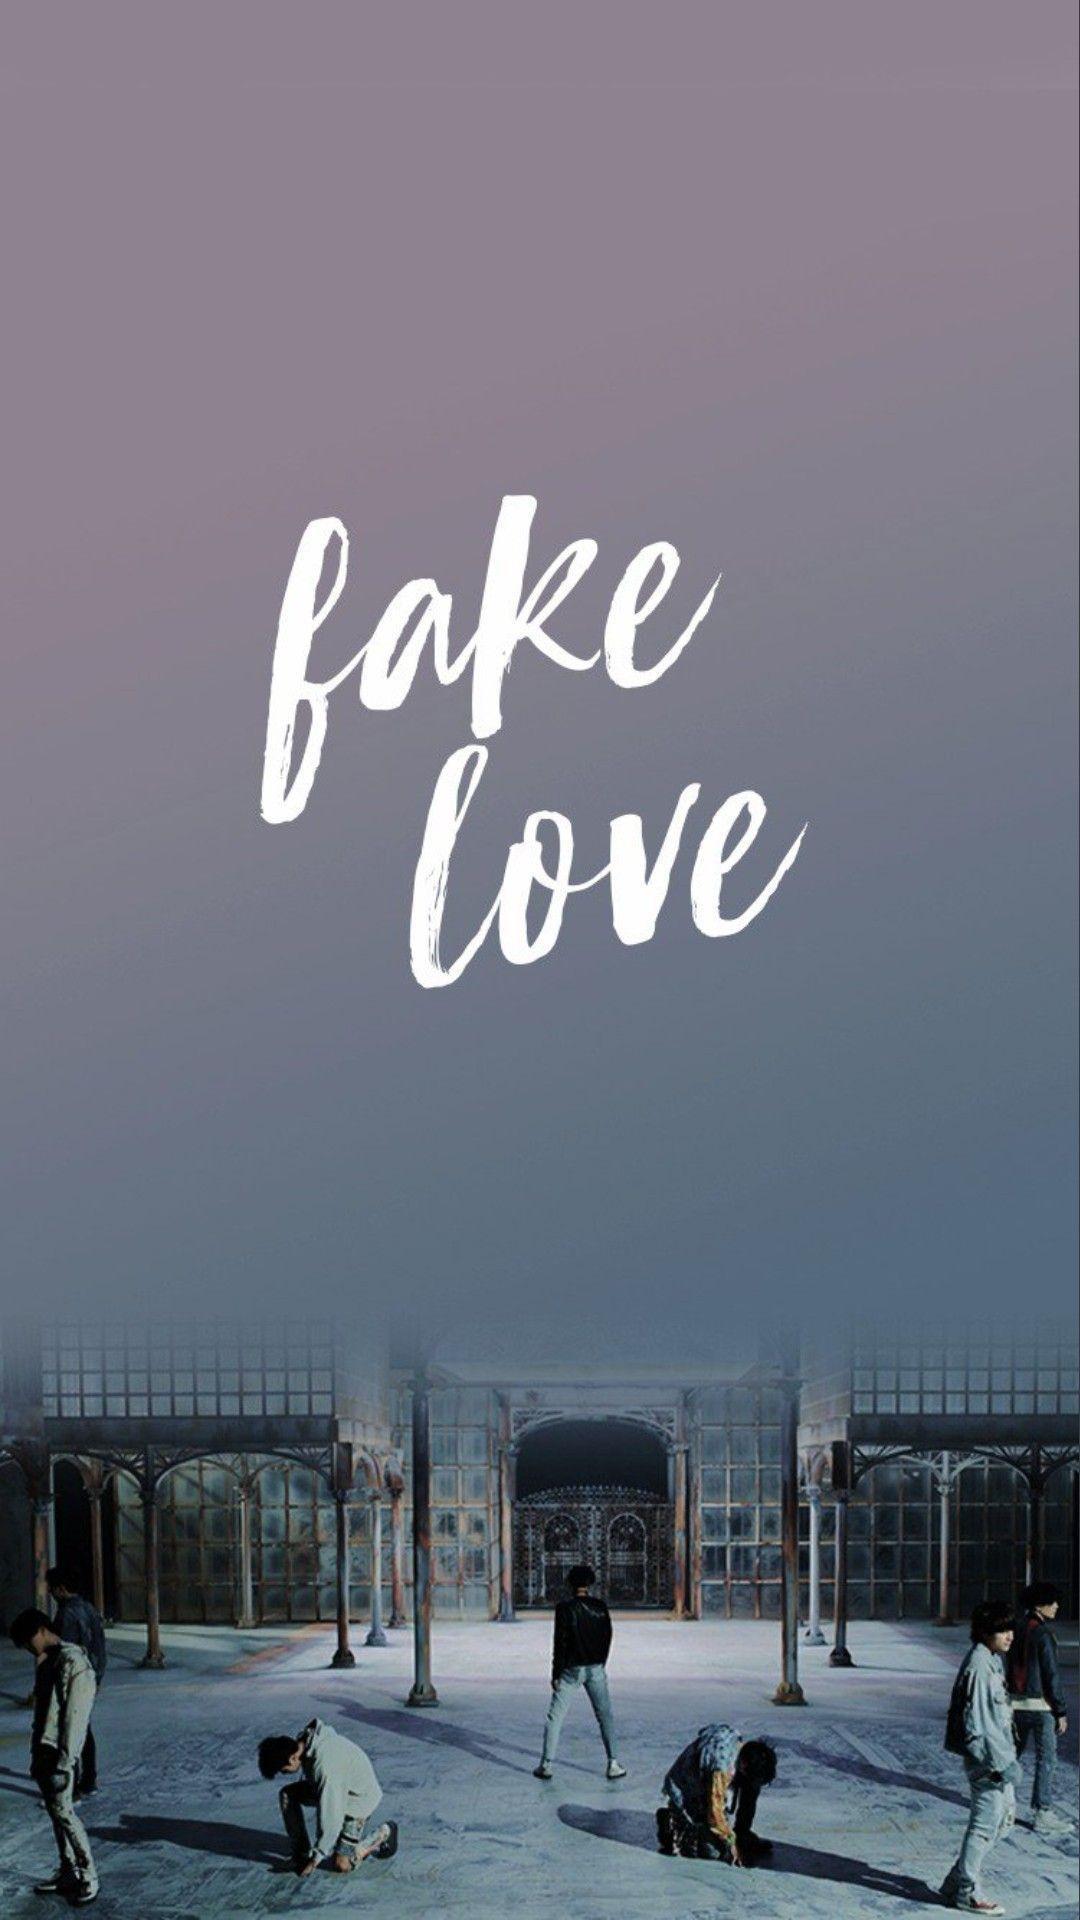 Bts Fake Love Wallpapers Top Free Bts Fake Love